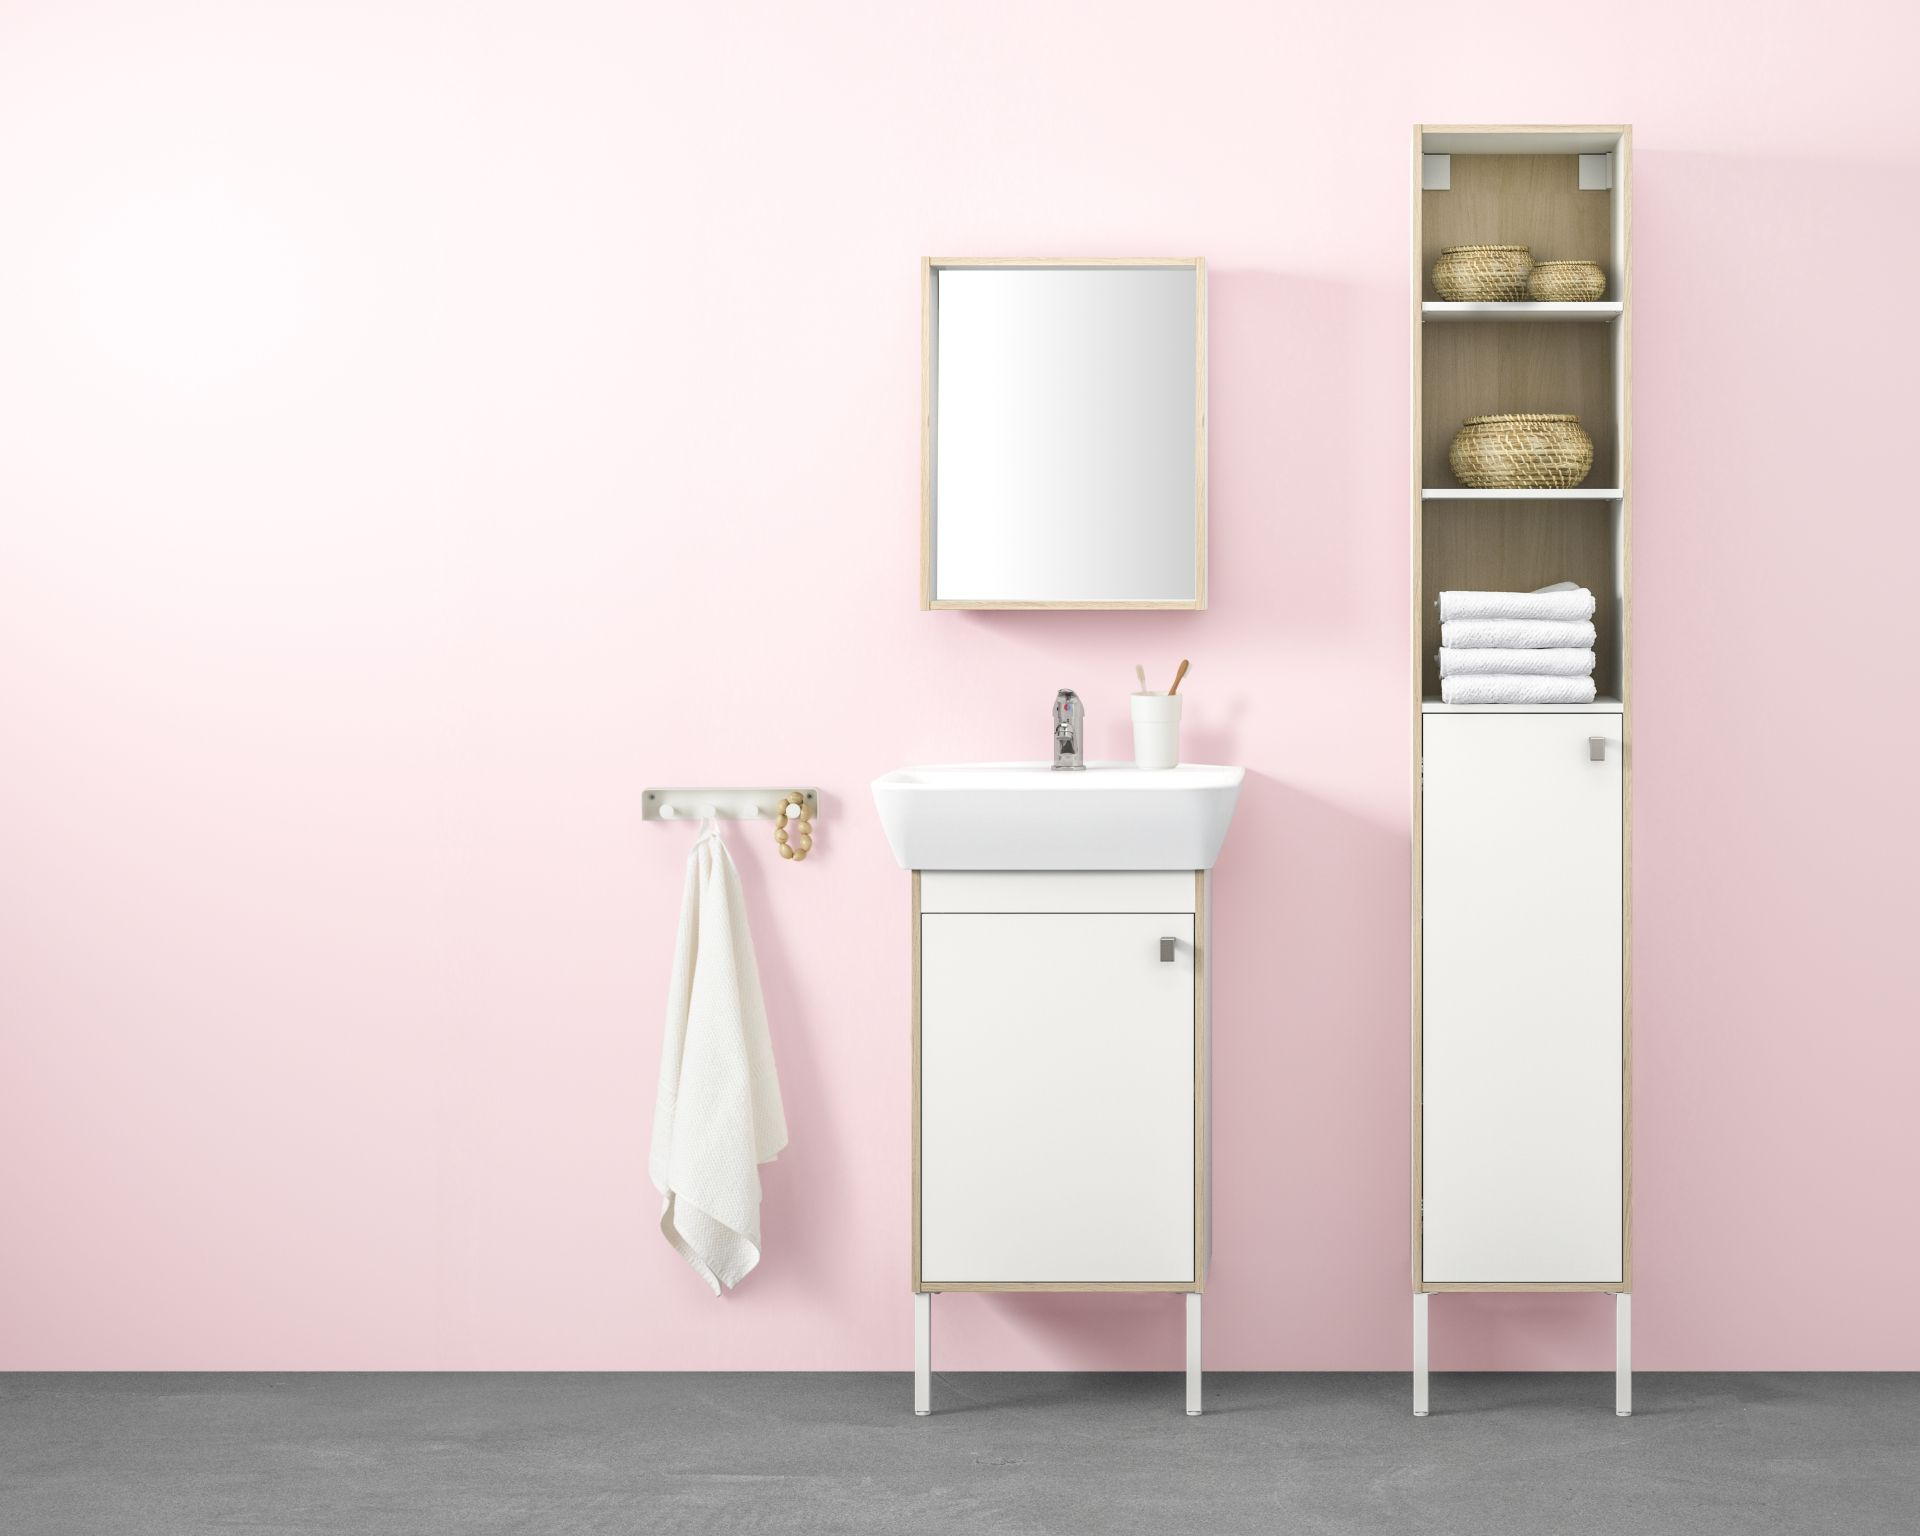 Ikea Badkamer Ikea : Tyngen wastafelcombinatie ikeacatalogus nieuw ikea ikeanl